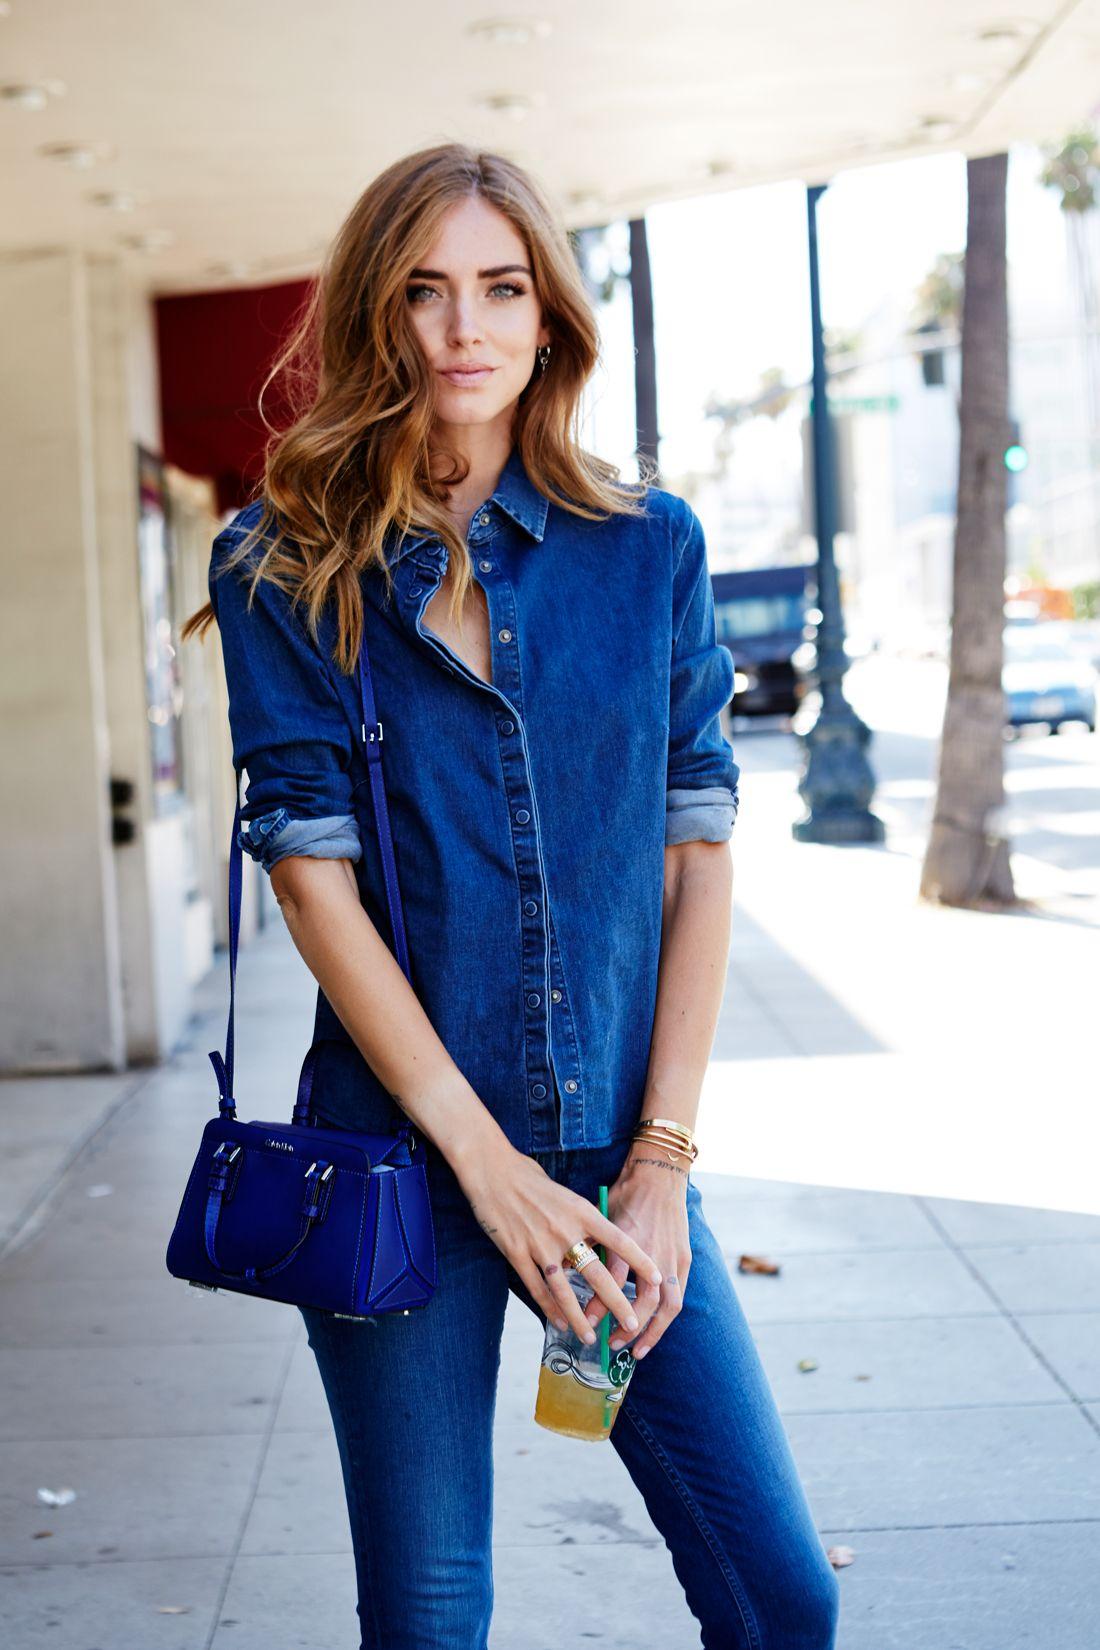 Chiara Ferragni The Blonde Salad Calvin Klein Denim Jeans And Shirt Sofie Duffle Bag Streetstyle